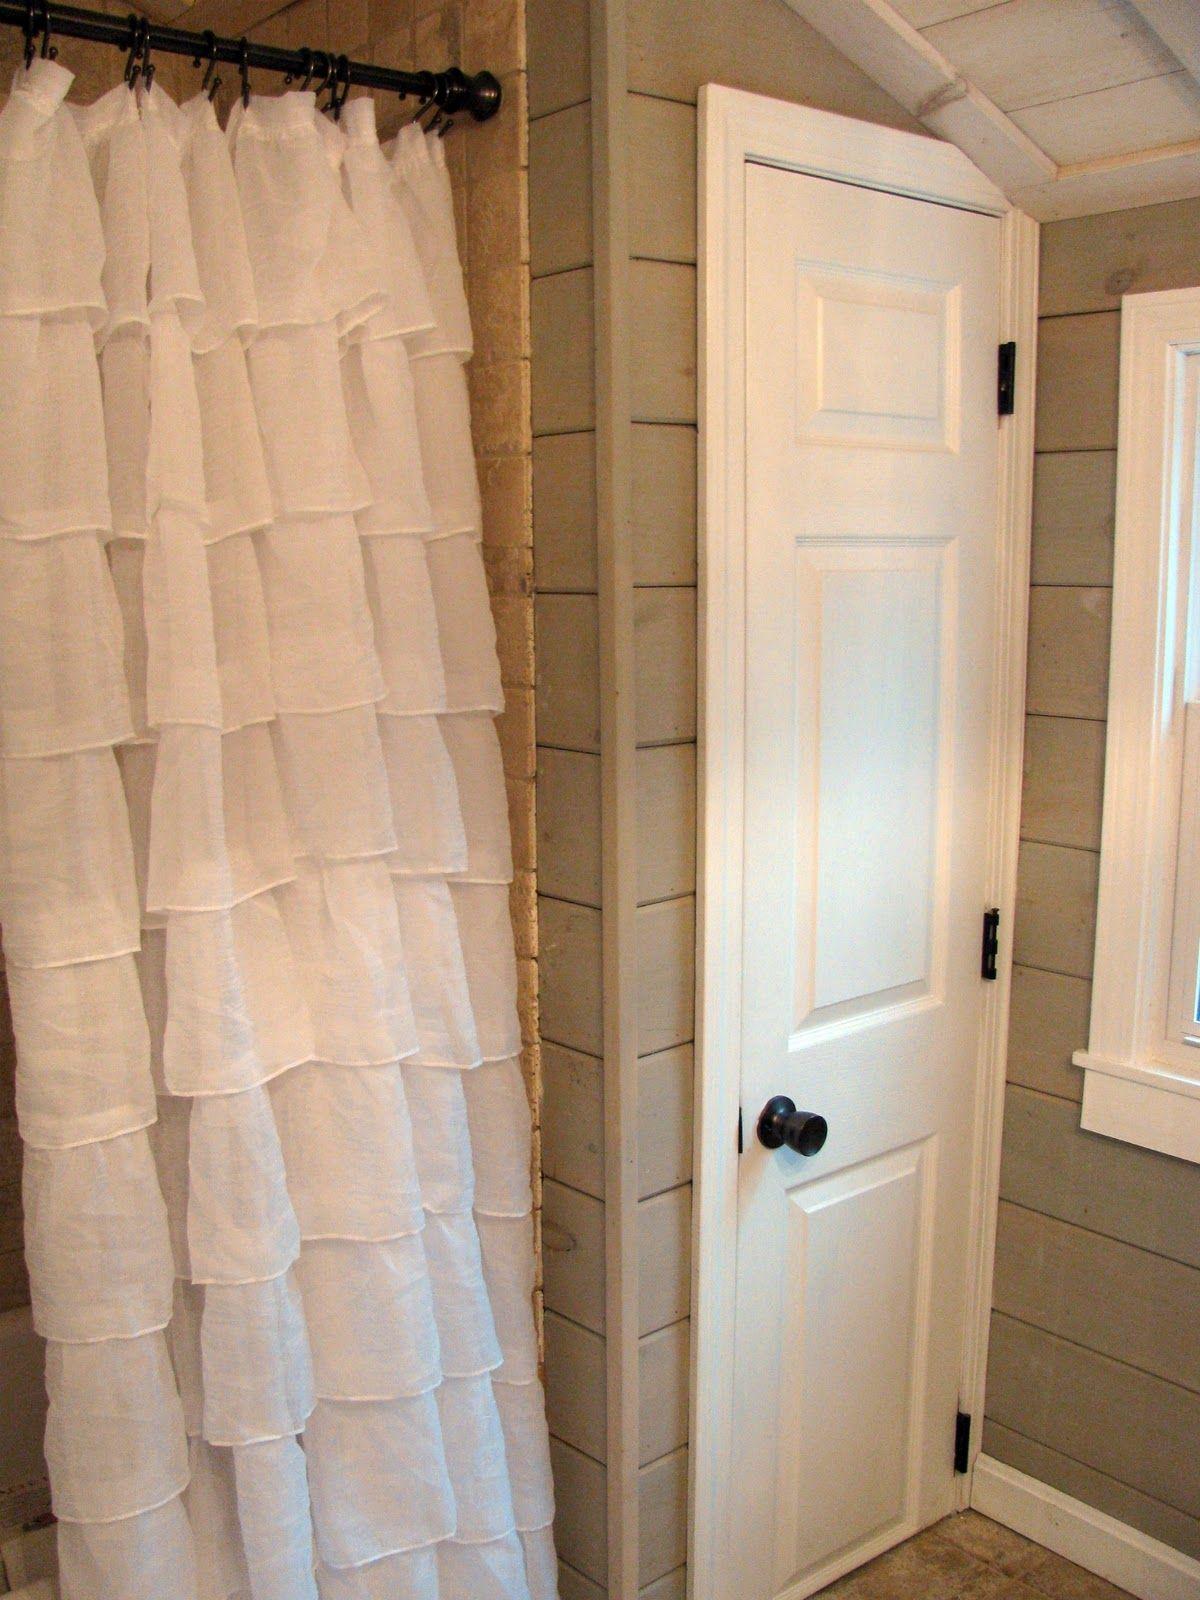 Great ideas inspiring diy projects upstairs bathrooms ruffle